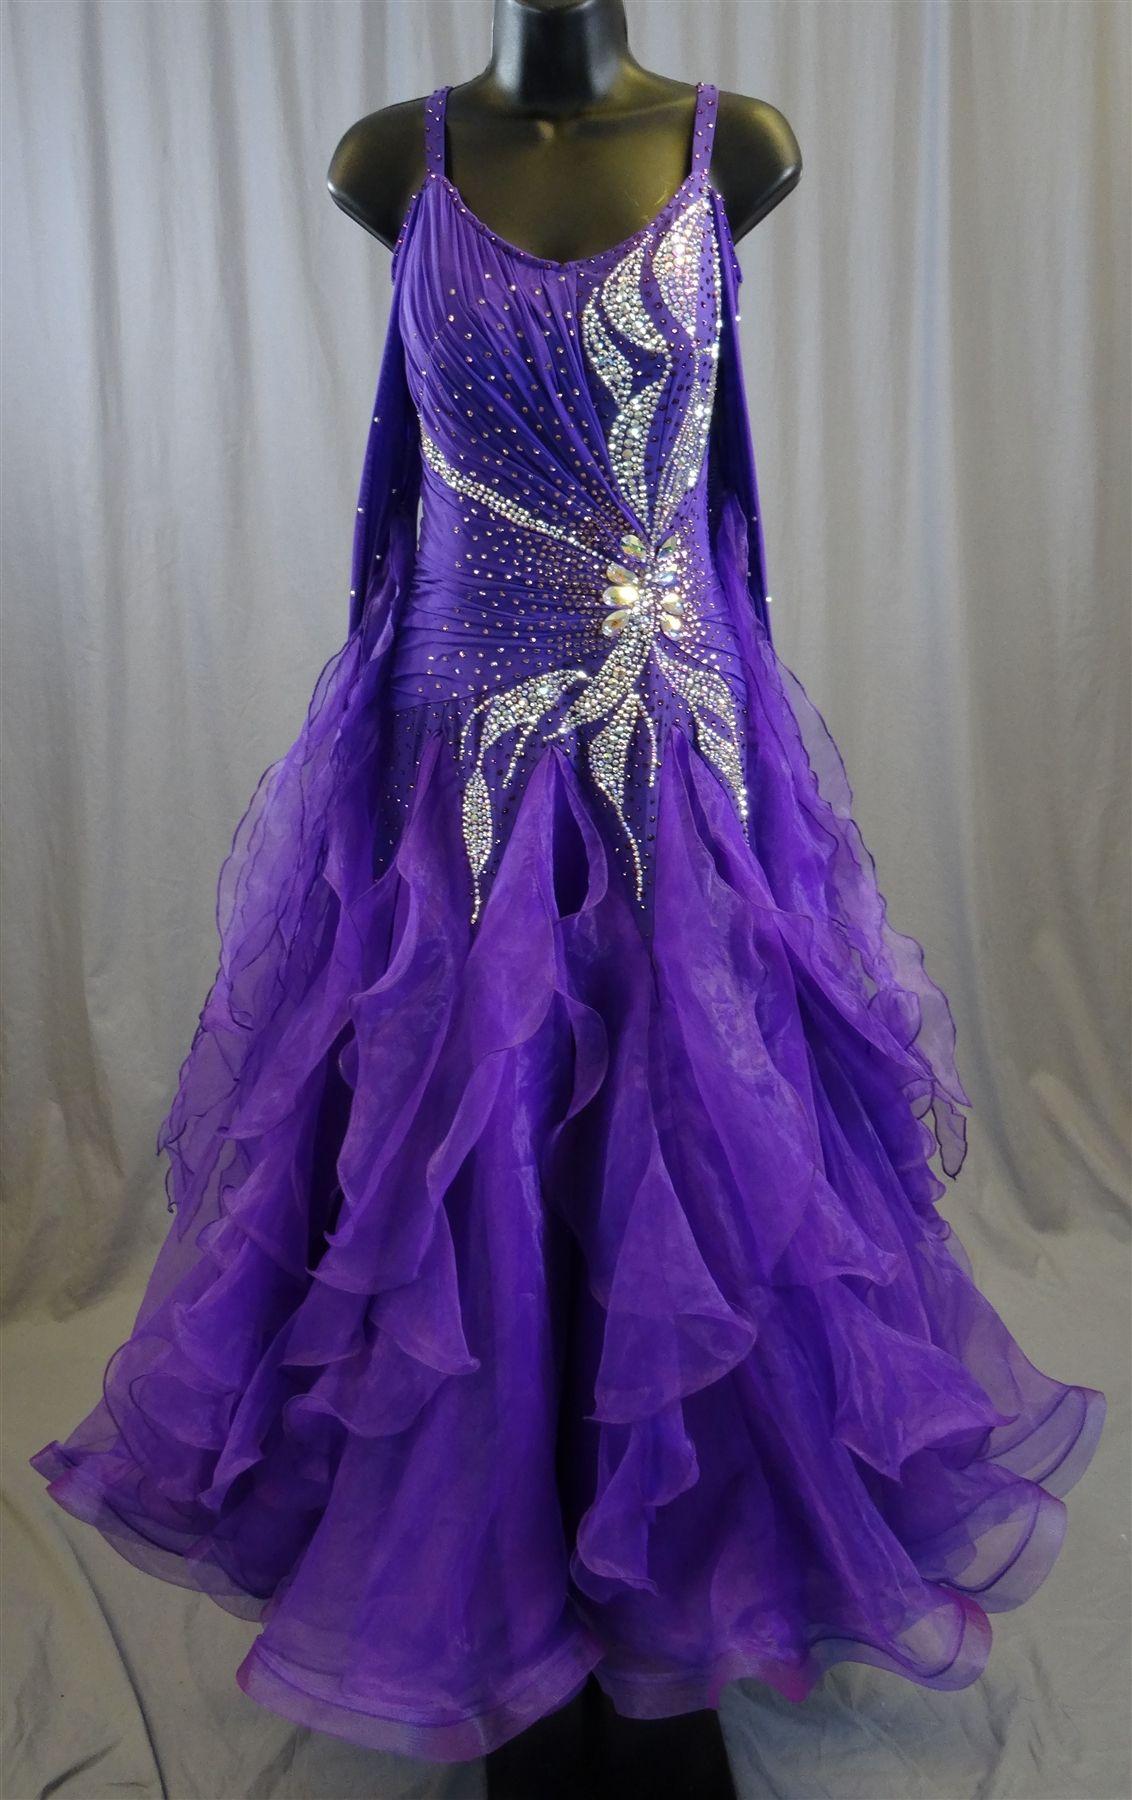 SMTHM0560 Ballroom Dress